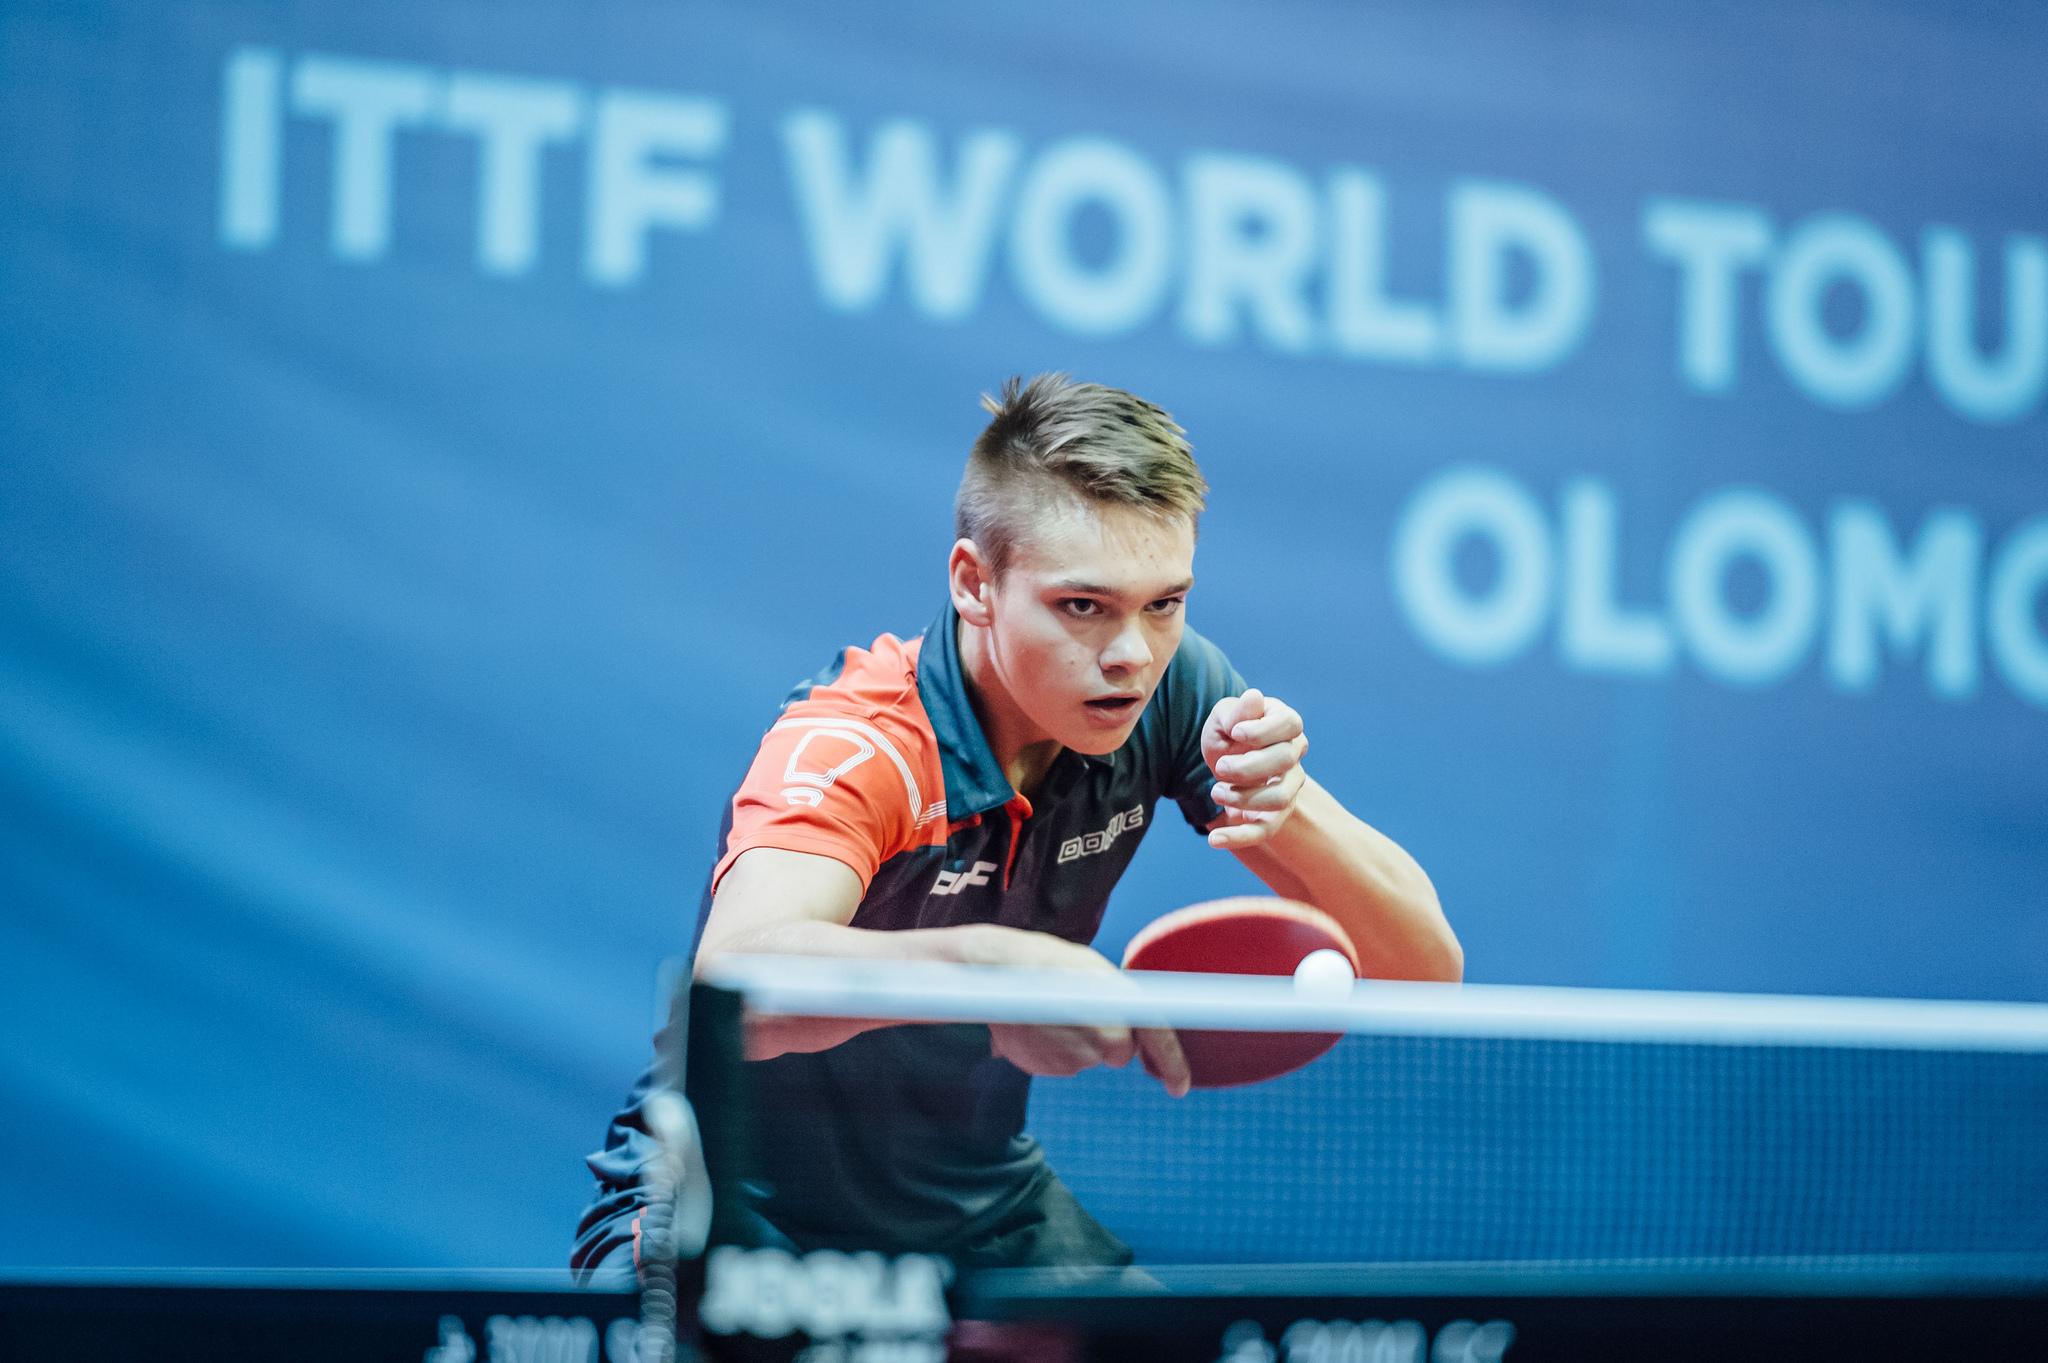 Praha hostí vrcholný turnaj juniorů ve stolním tenise – kadet Jan Valenta. Foto: www.ping-pong.cz